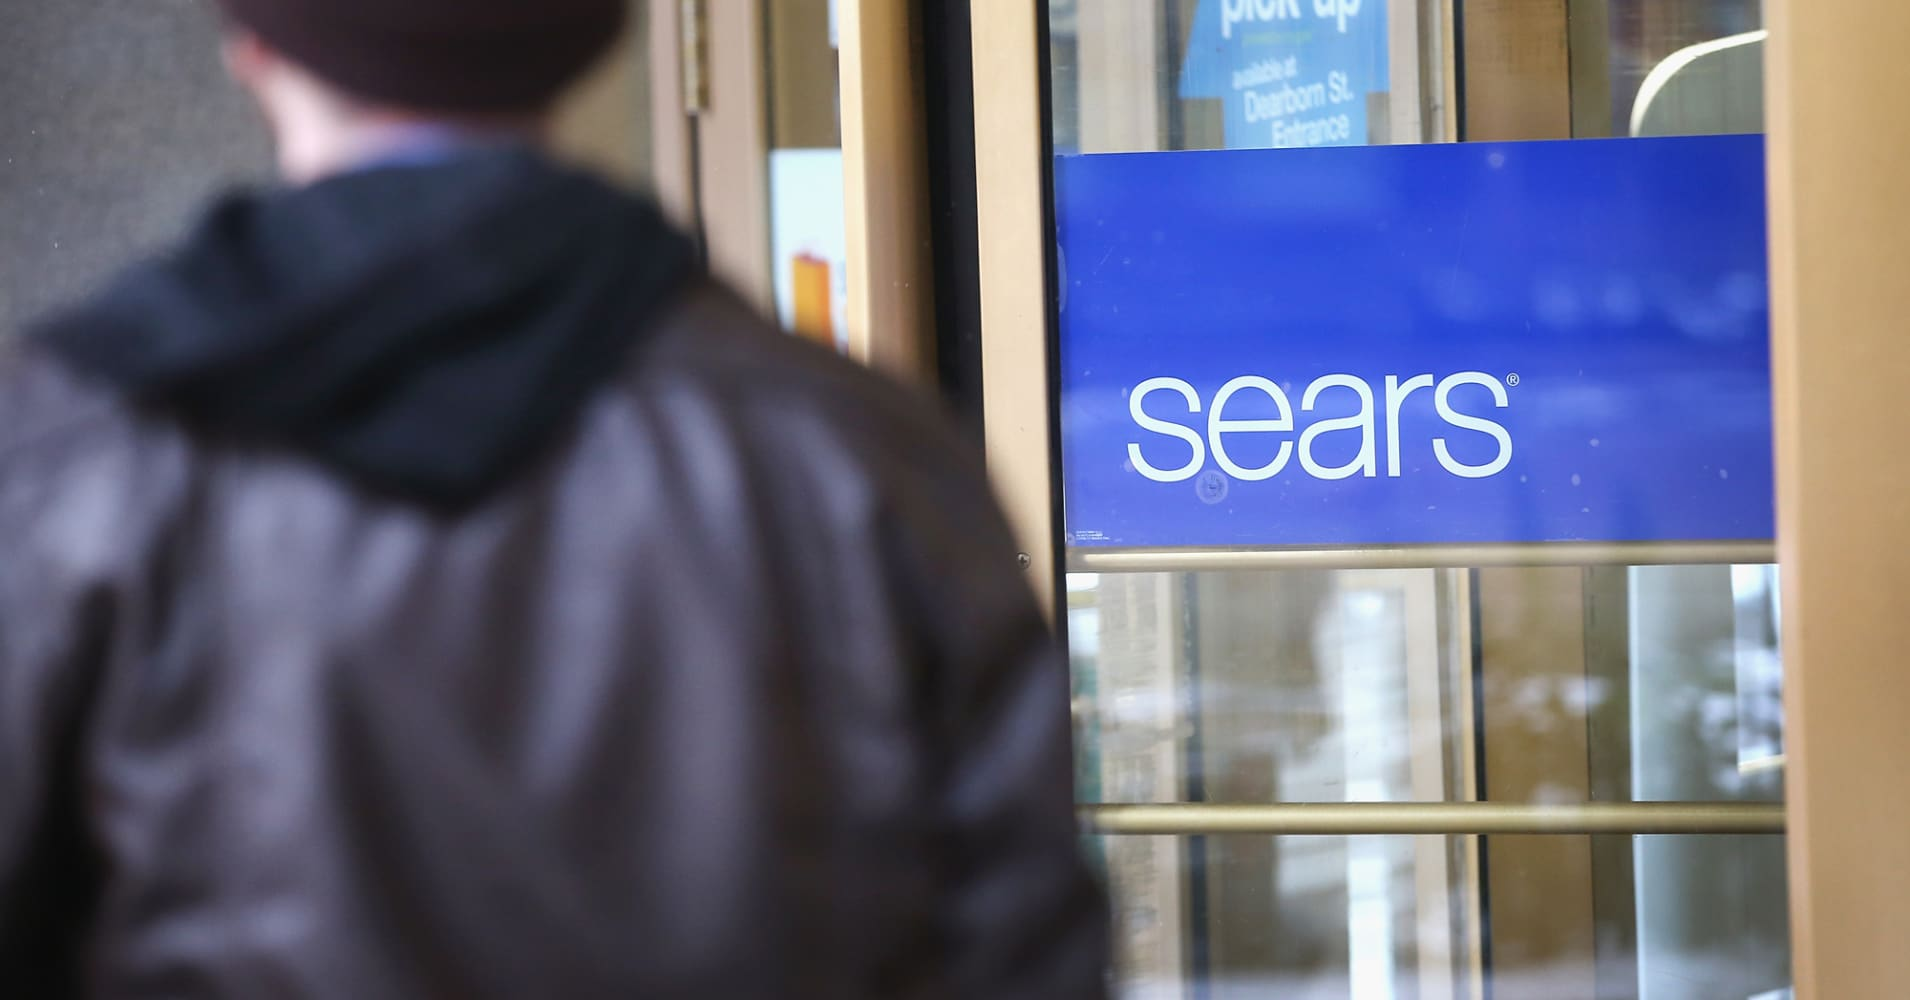 sears value chain analysis